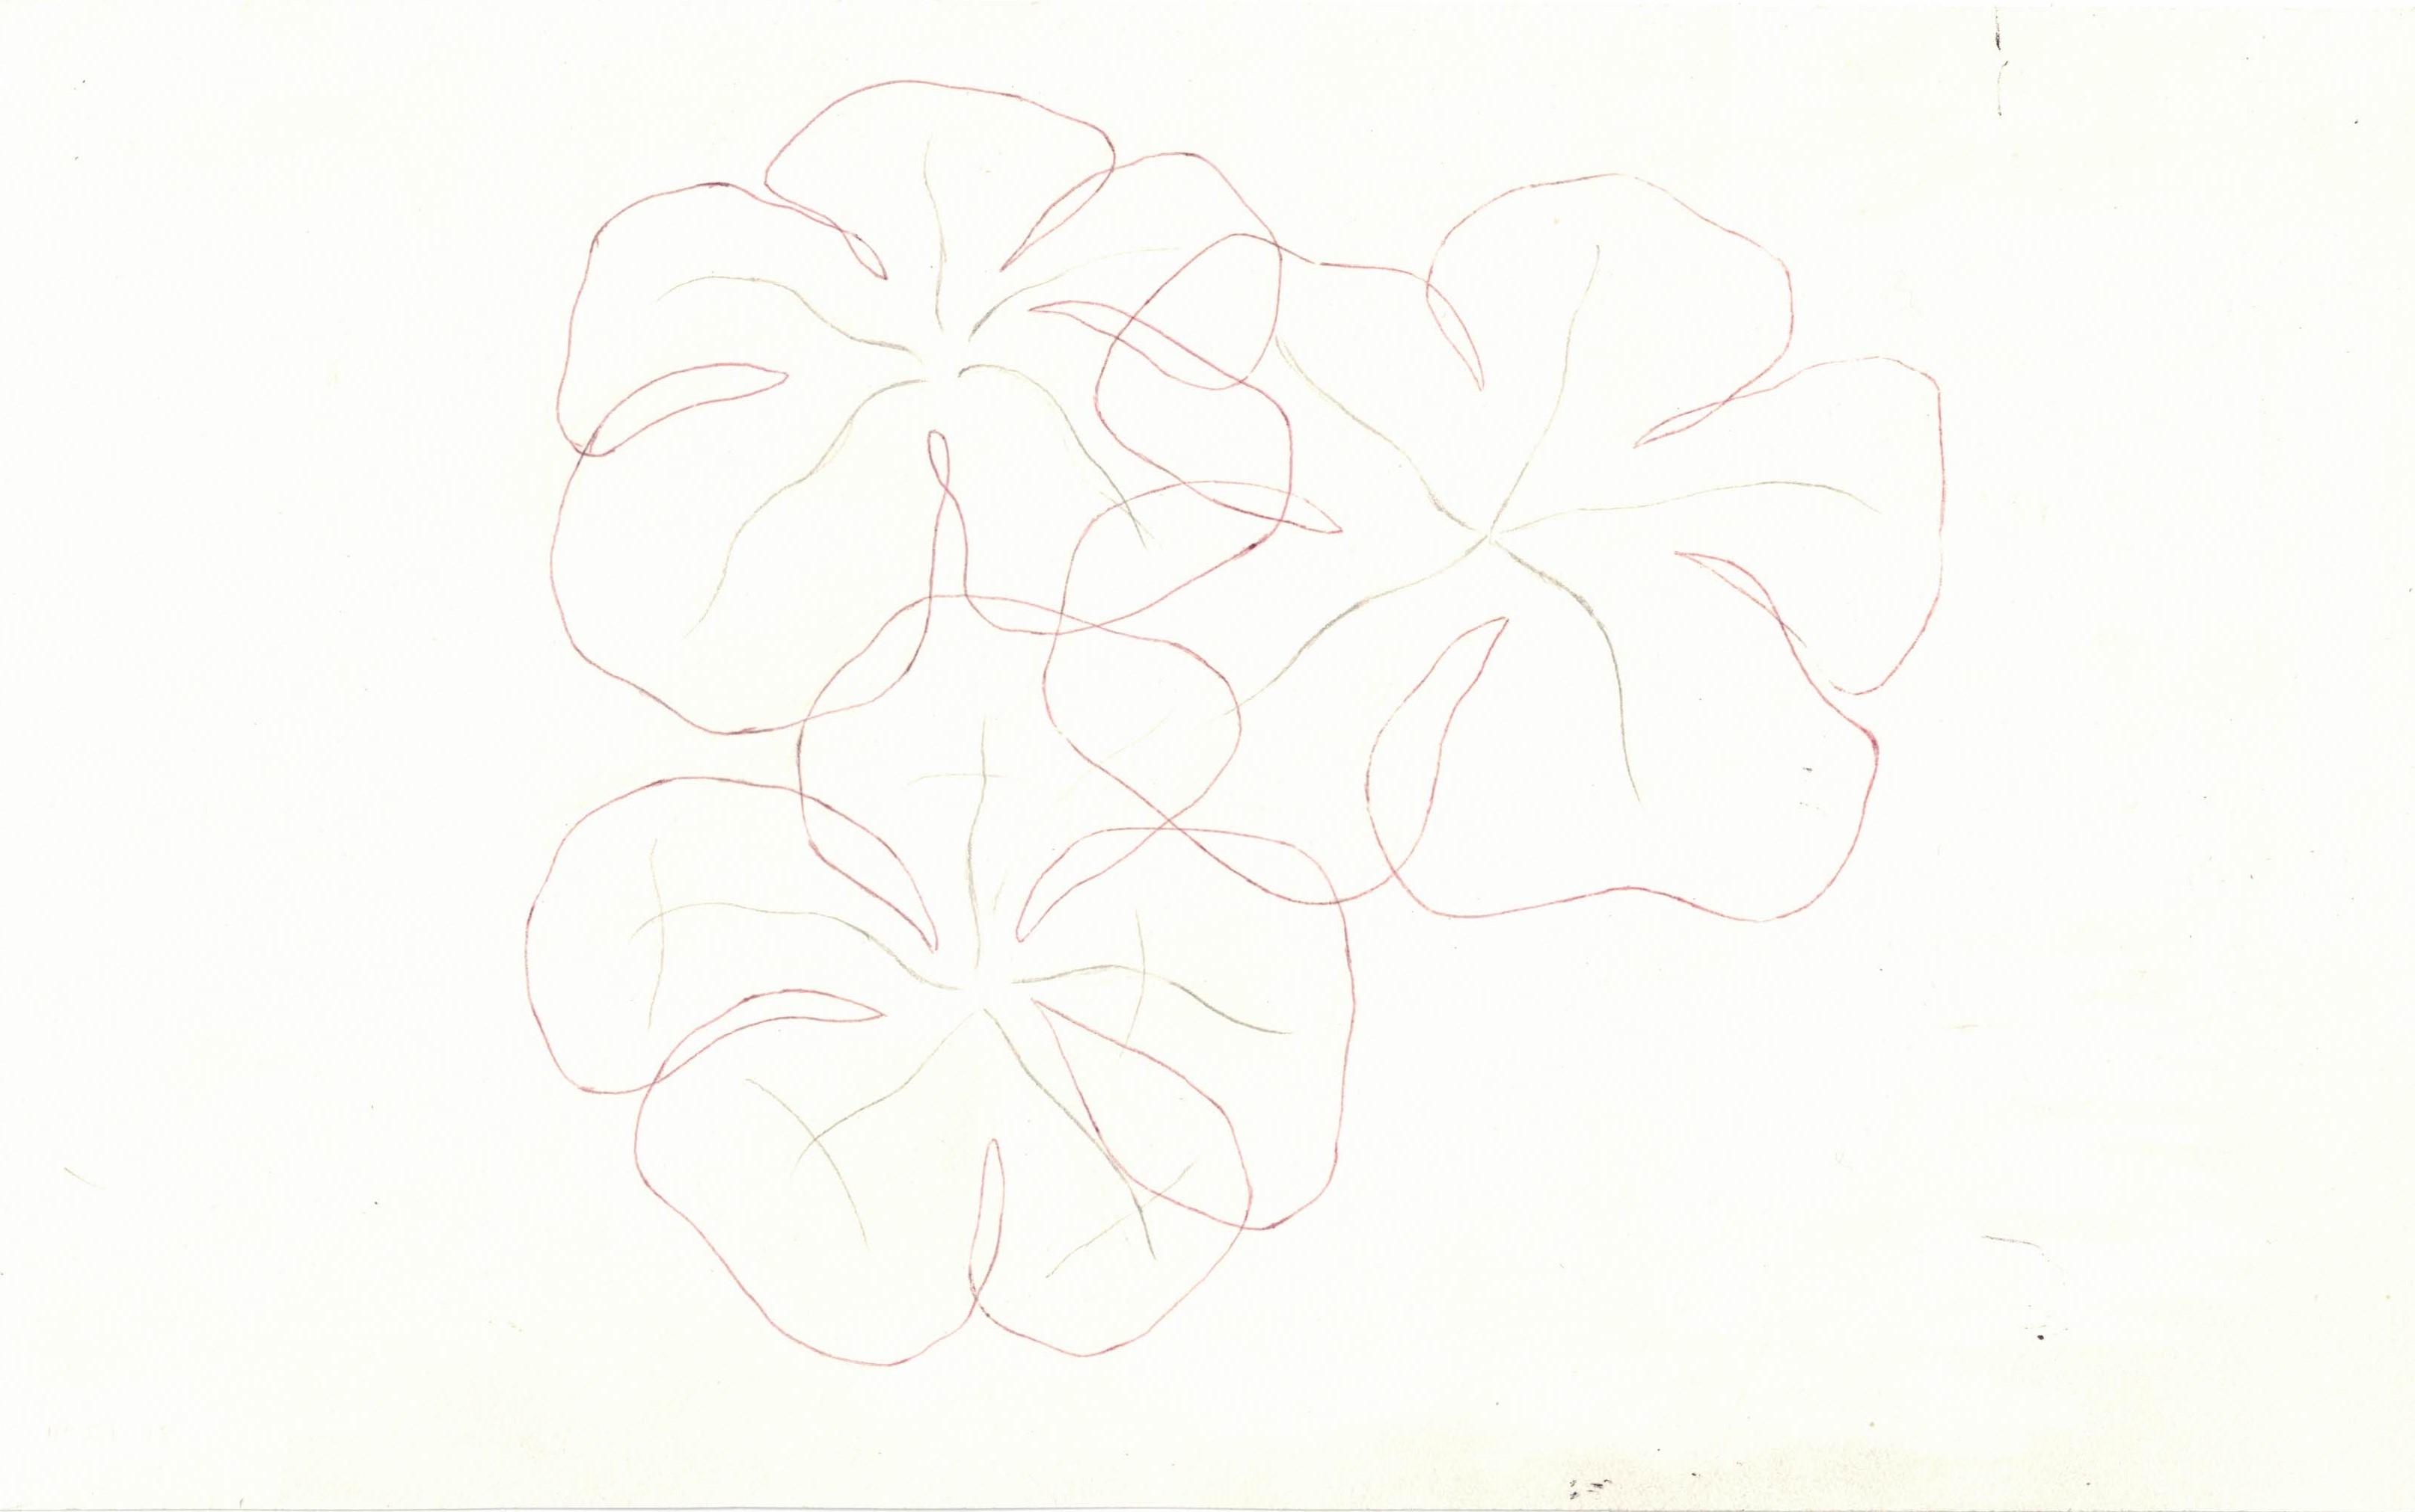 flowers ii, edit i, wilted study (1)